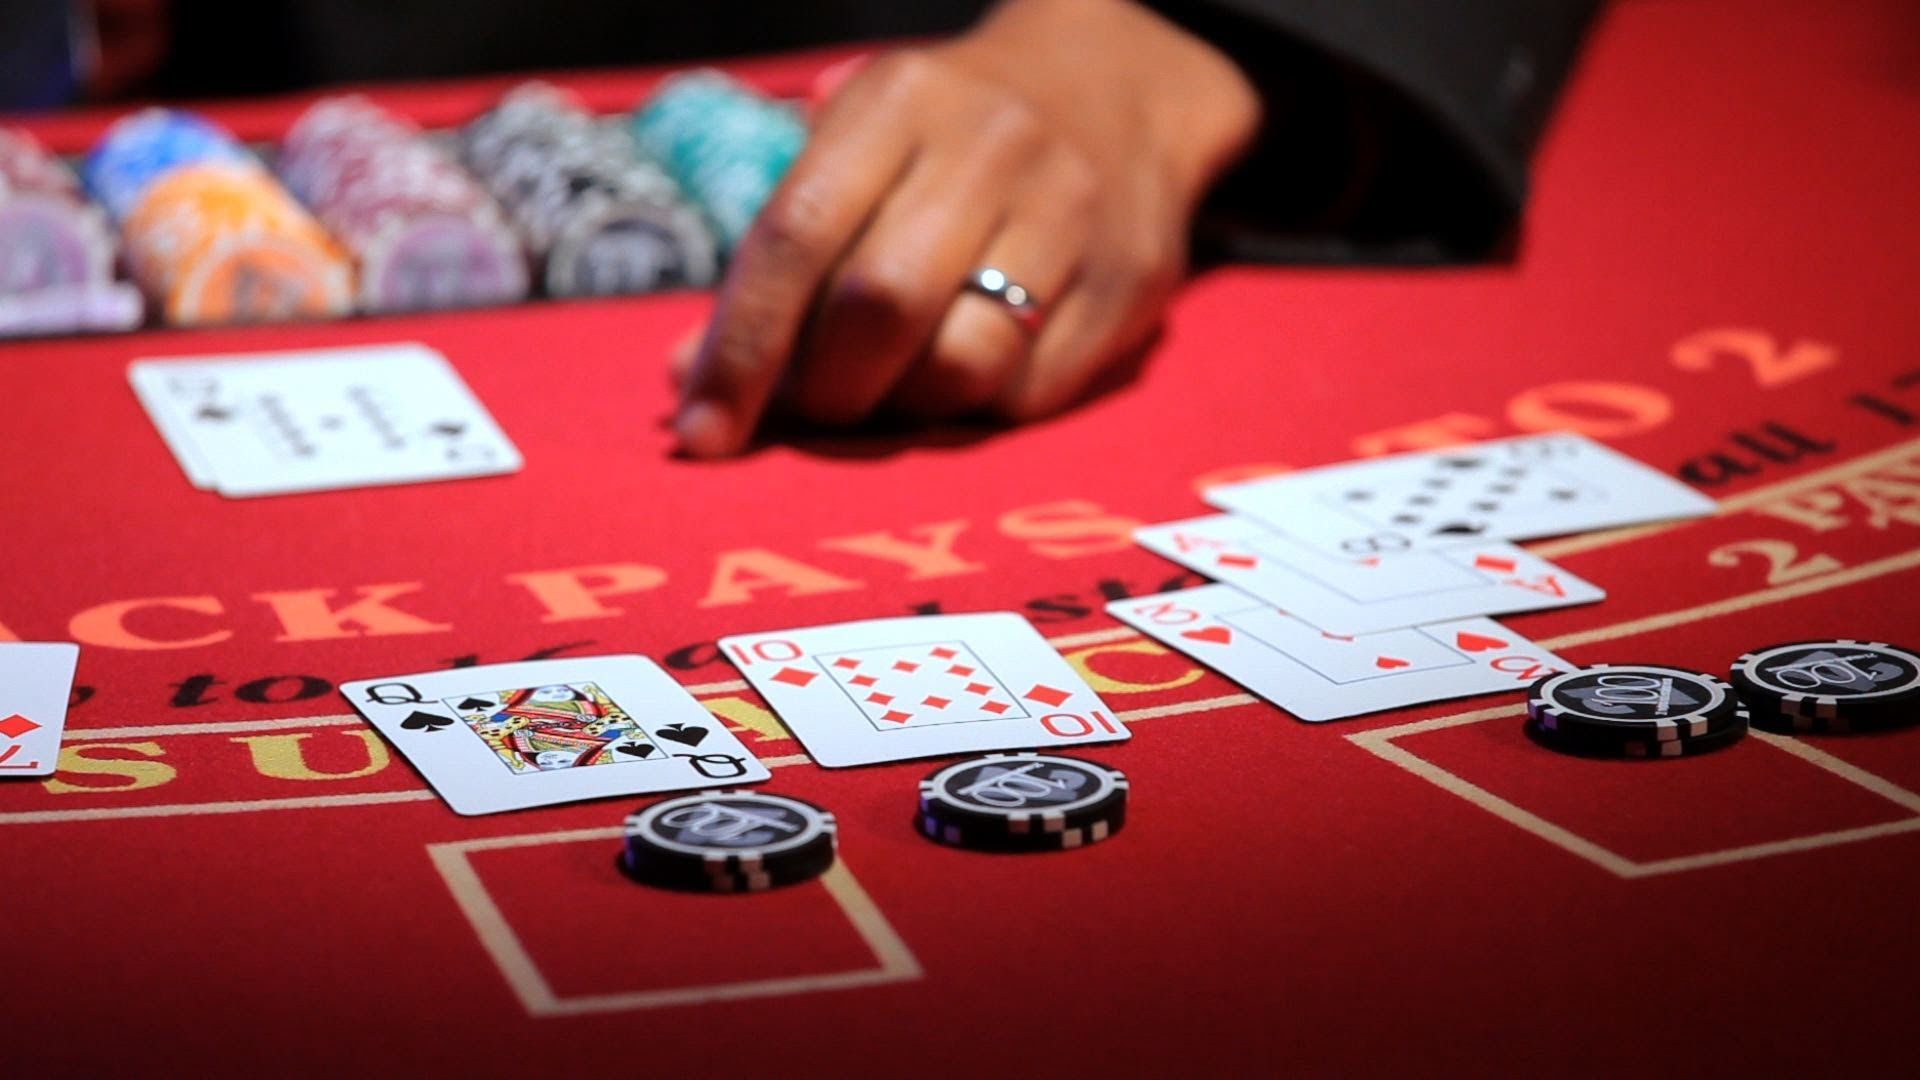 Blackjack Mistakes to Avoid | Gambling Tips | Blackjack, Gambling party,  Gambling